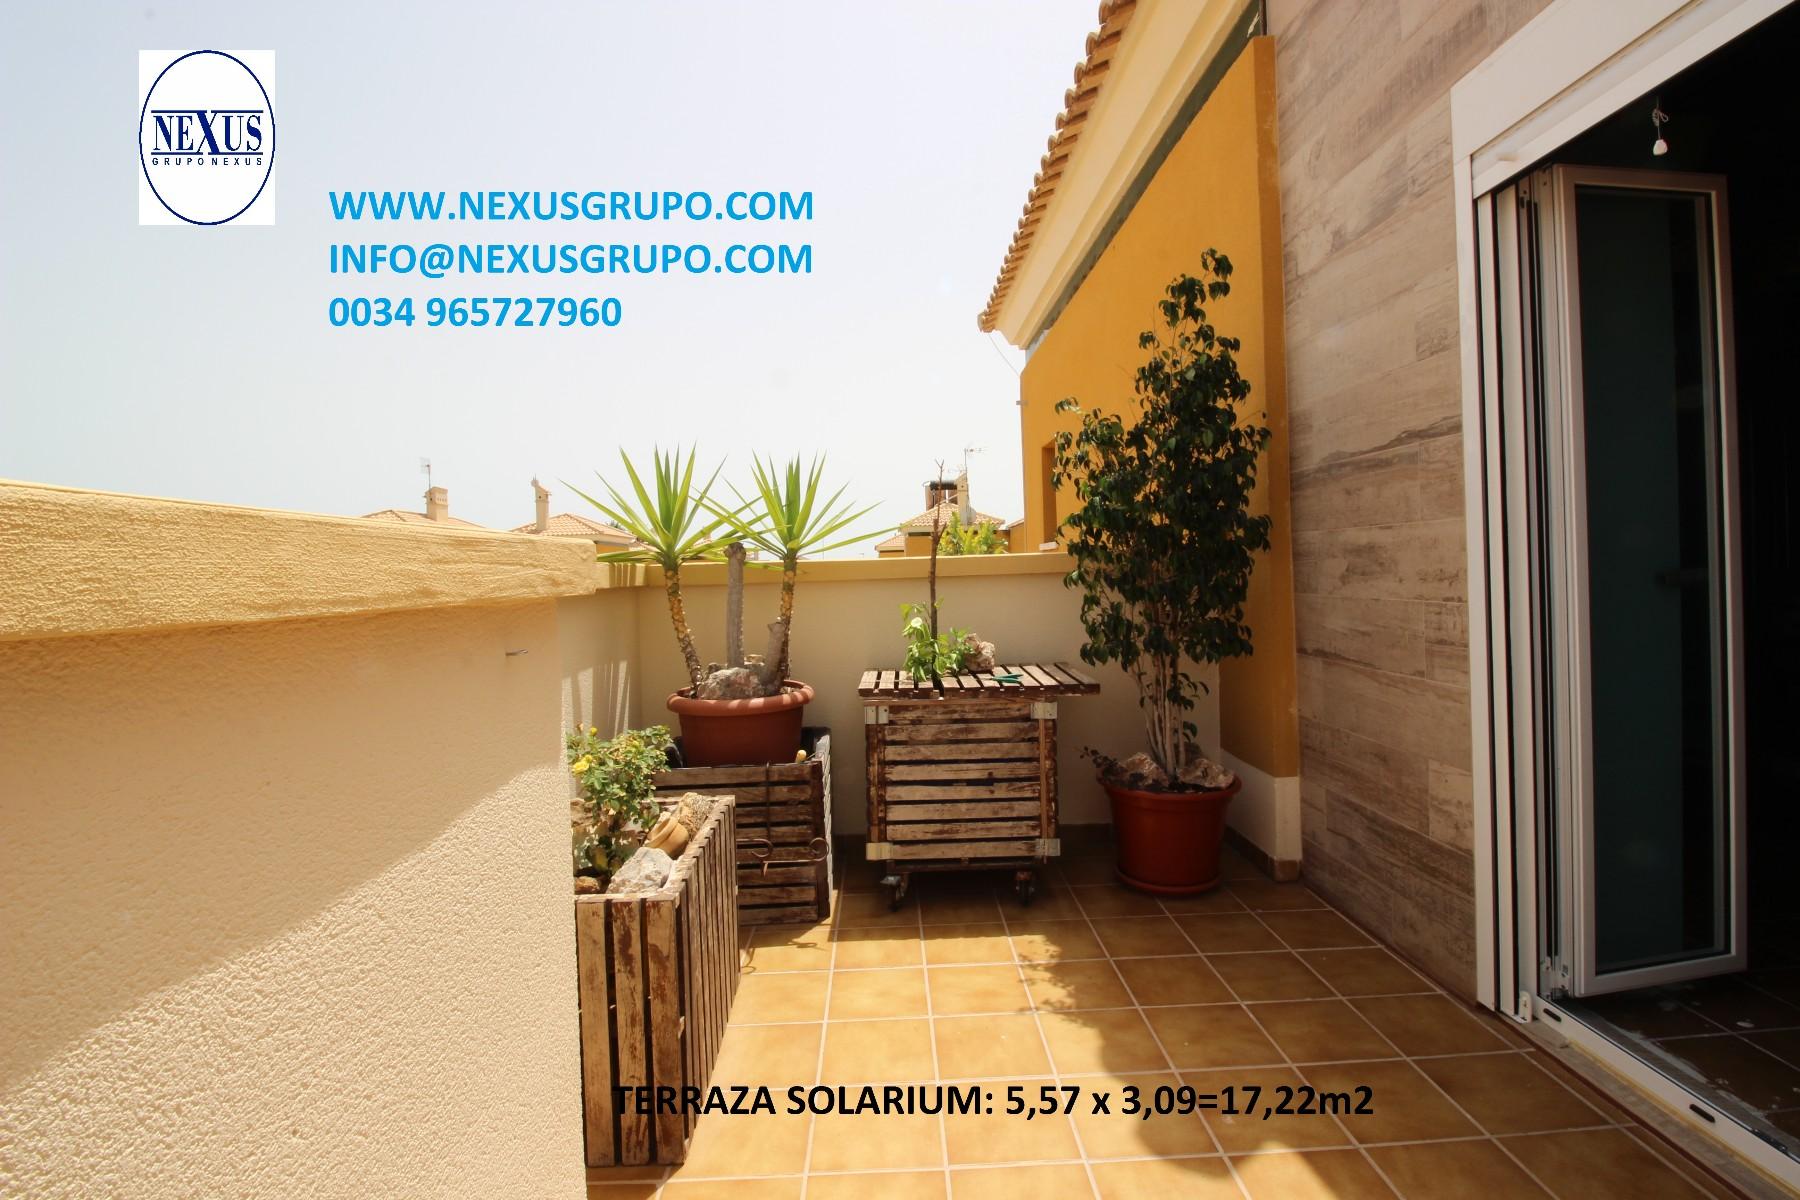 Inmobiliaria Grupo Nexus, Sells, Excellent semi-detached house in the Bañet de Almoradí in Nexus Grupo